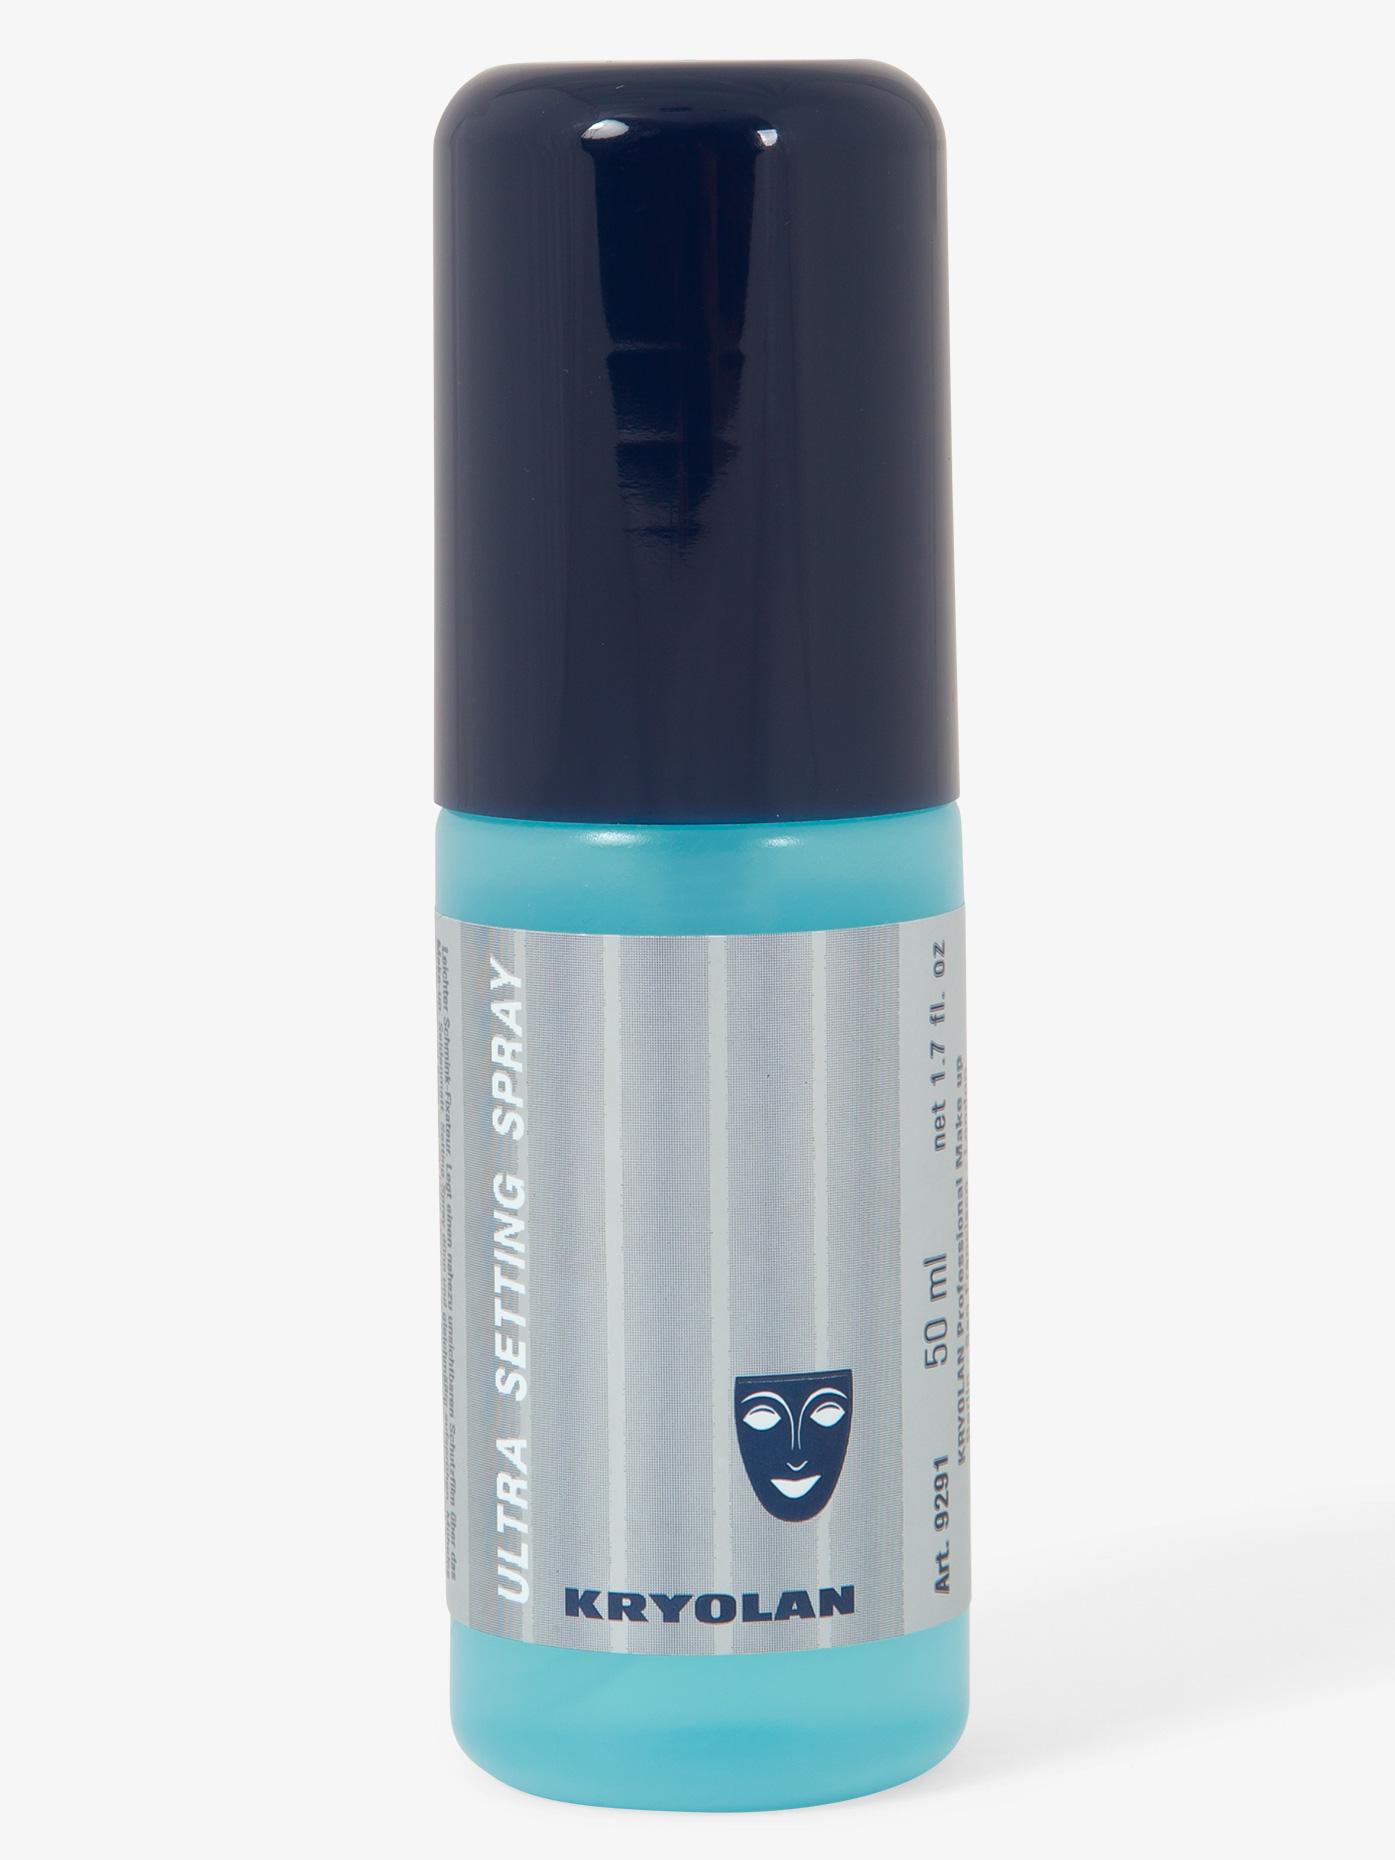 Kryolan Ultra Setting Spray K9291